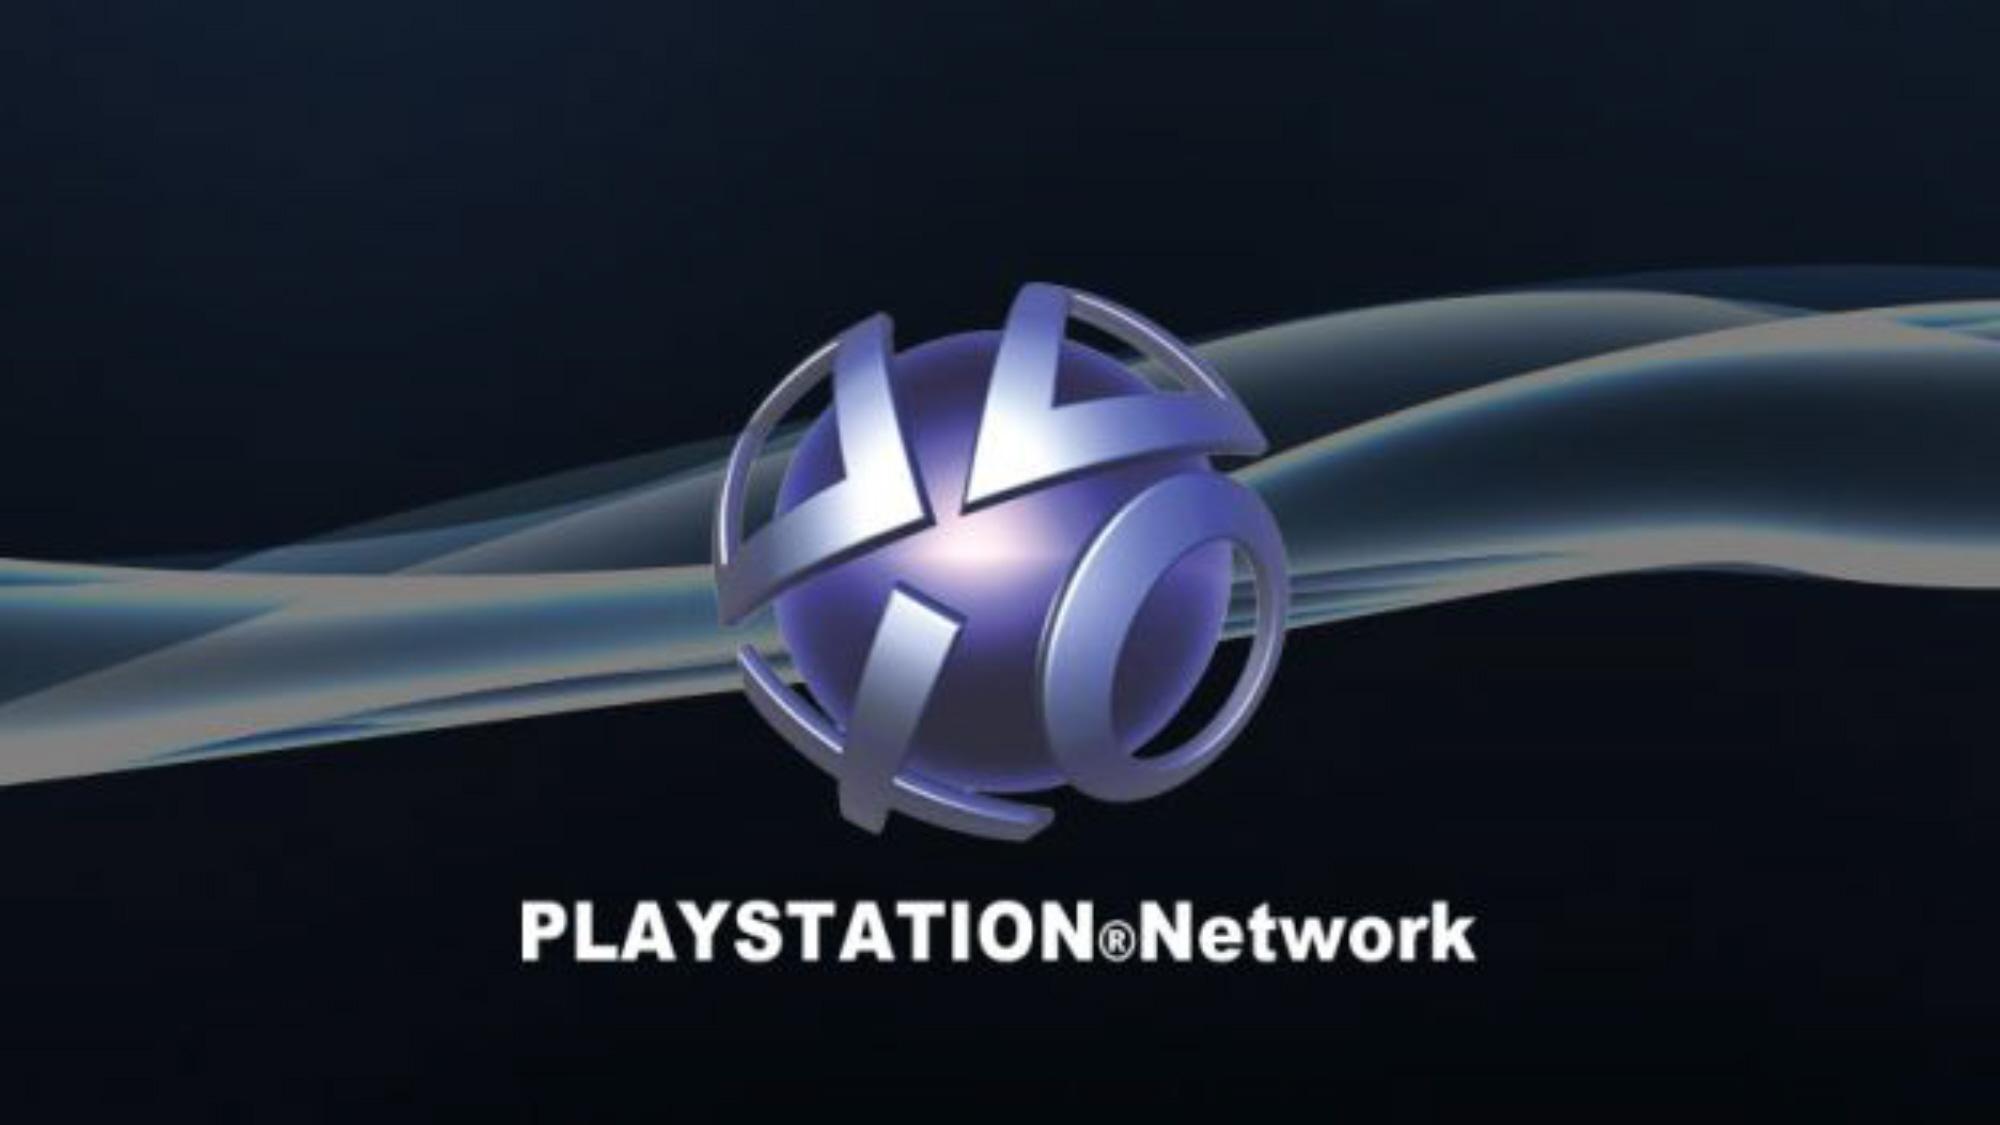 PlayStation Network still down, won't be online until Jan. 19